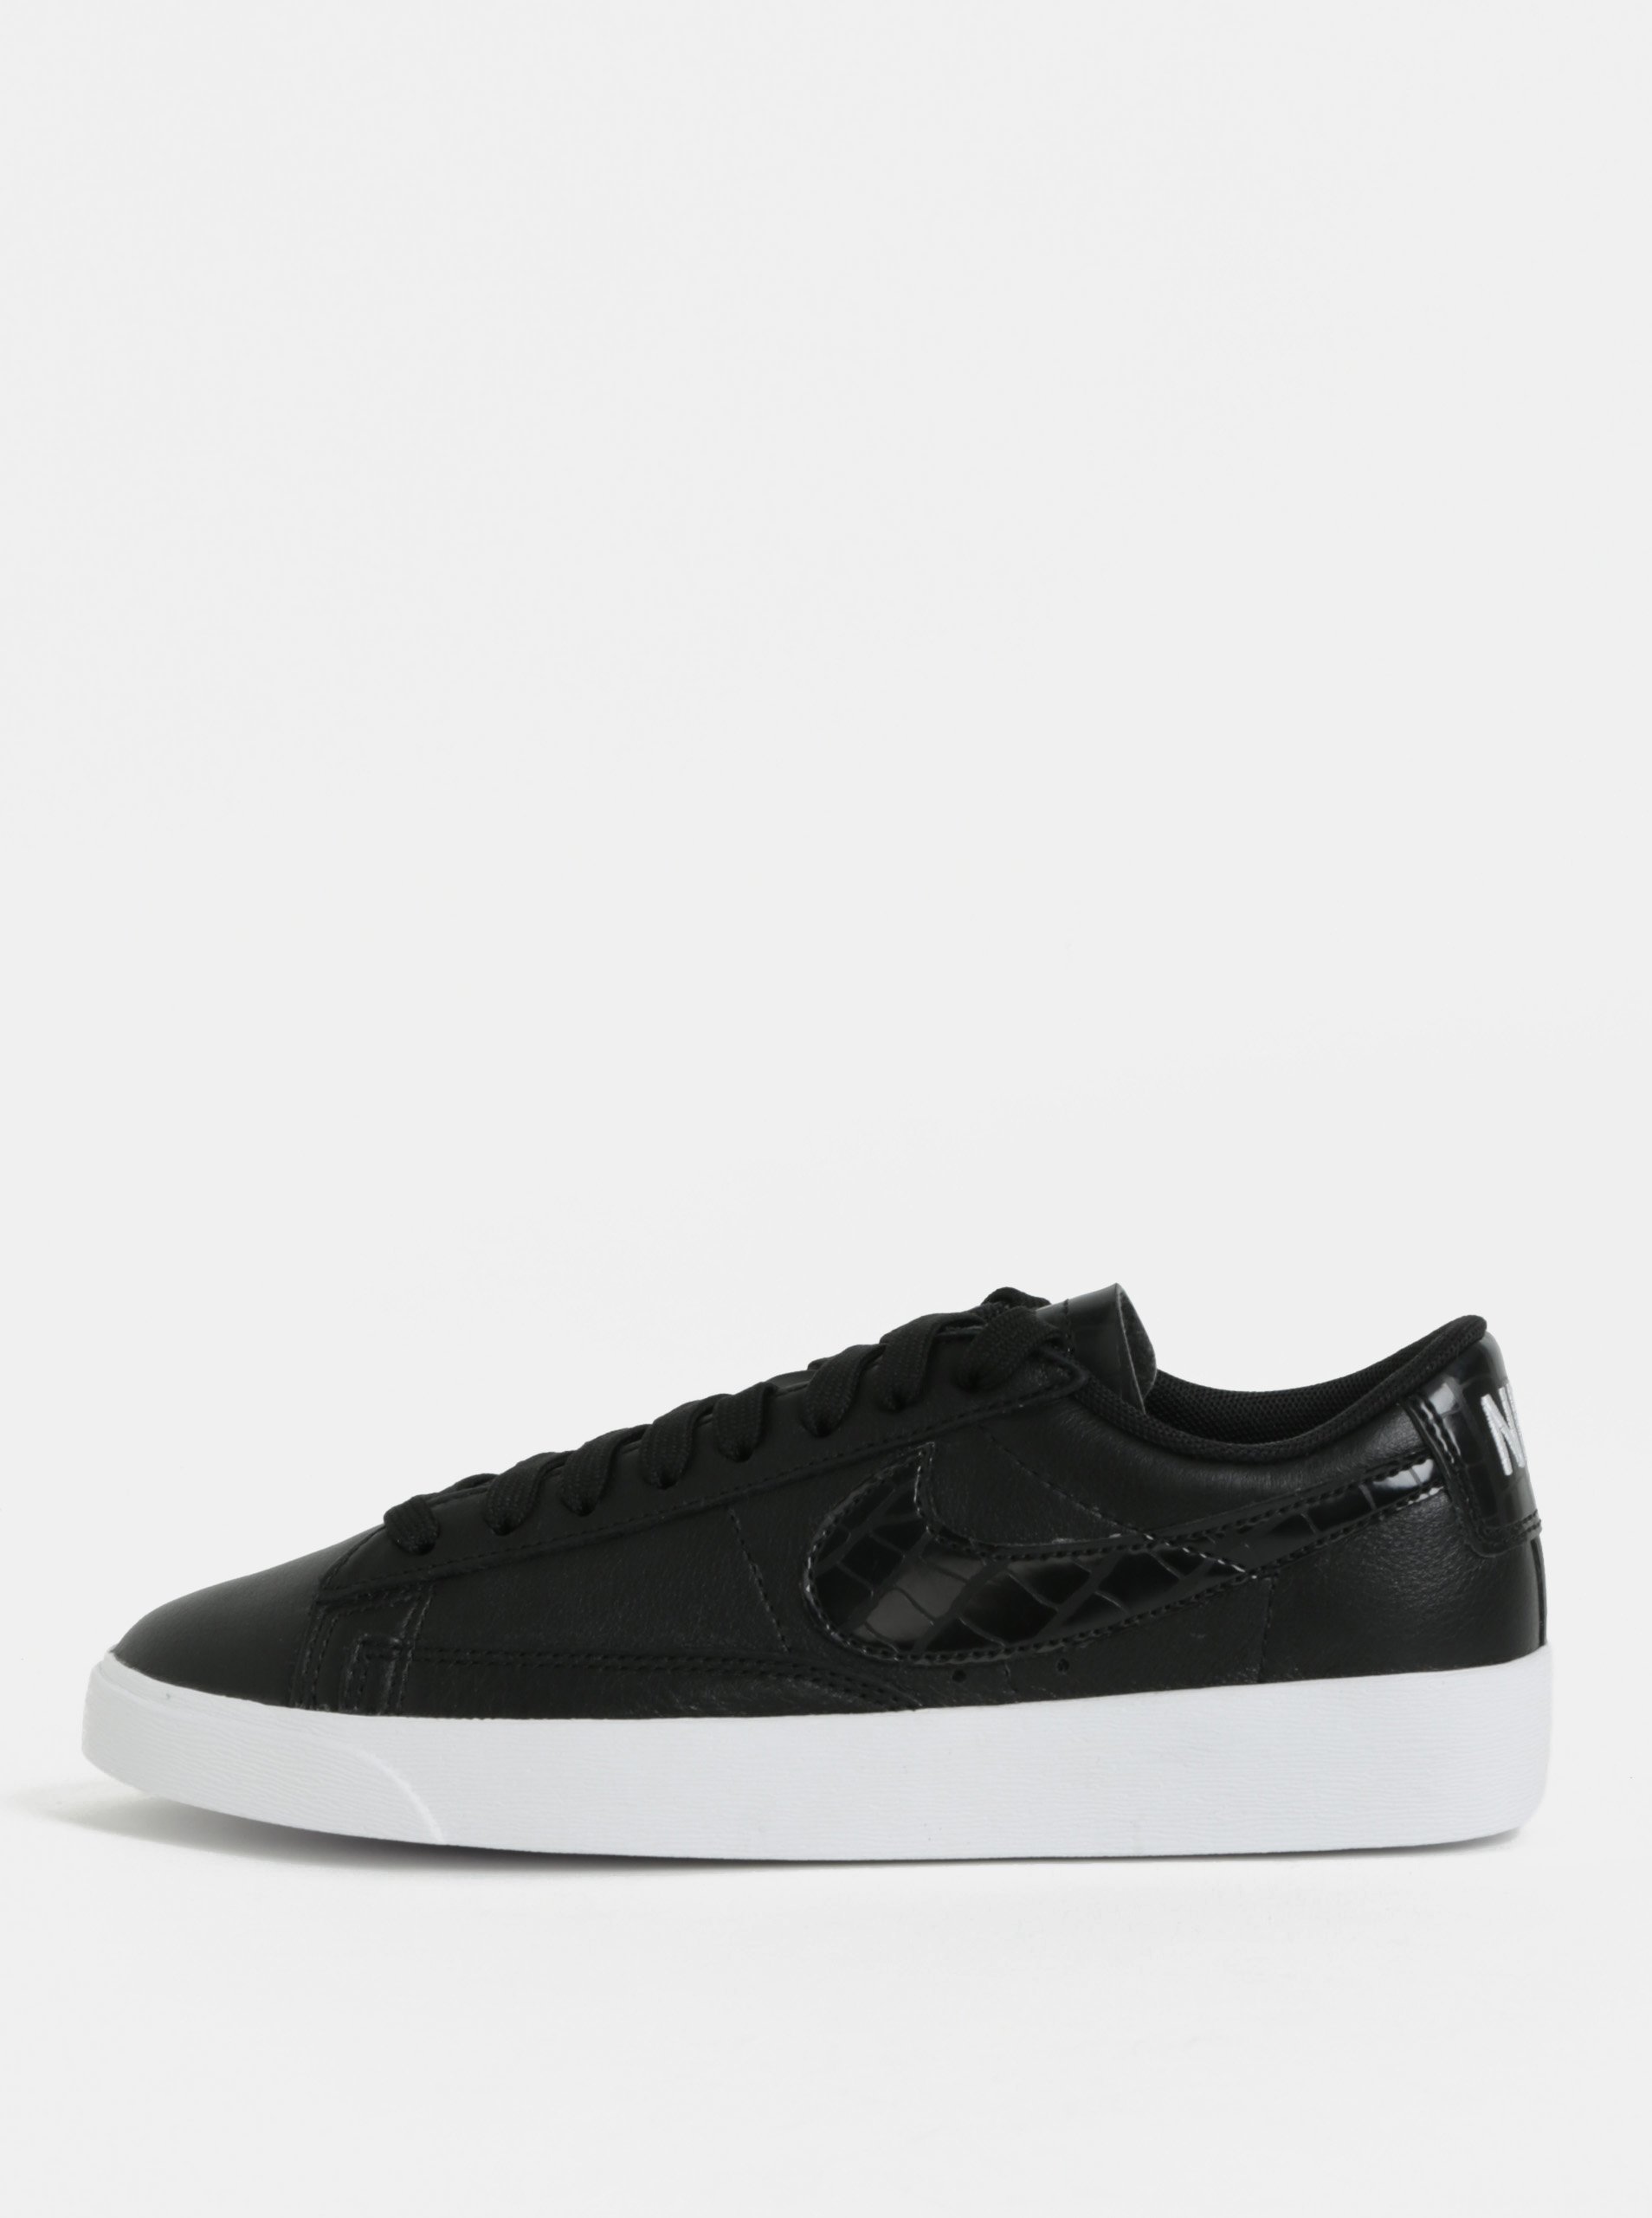 8ca815a34897c Čierne dámske kožené tenisky Nike Blazer Low Leather - Glami.sk